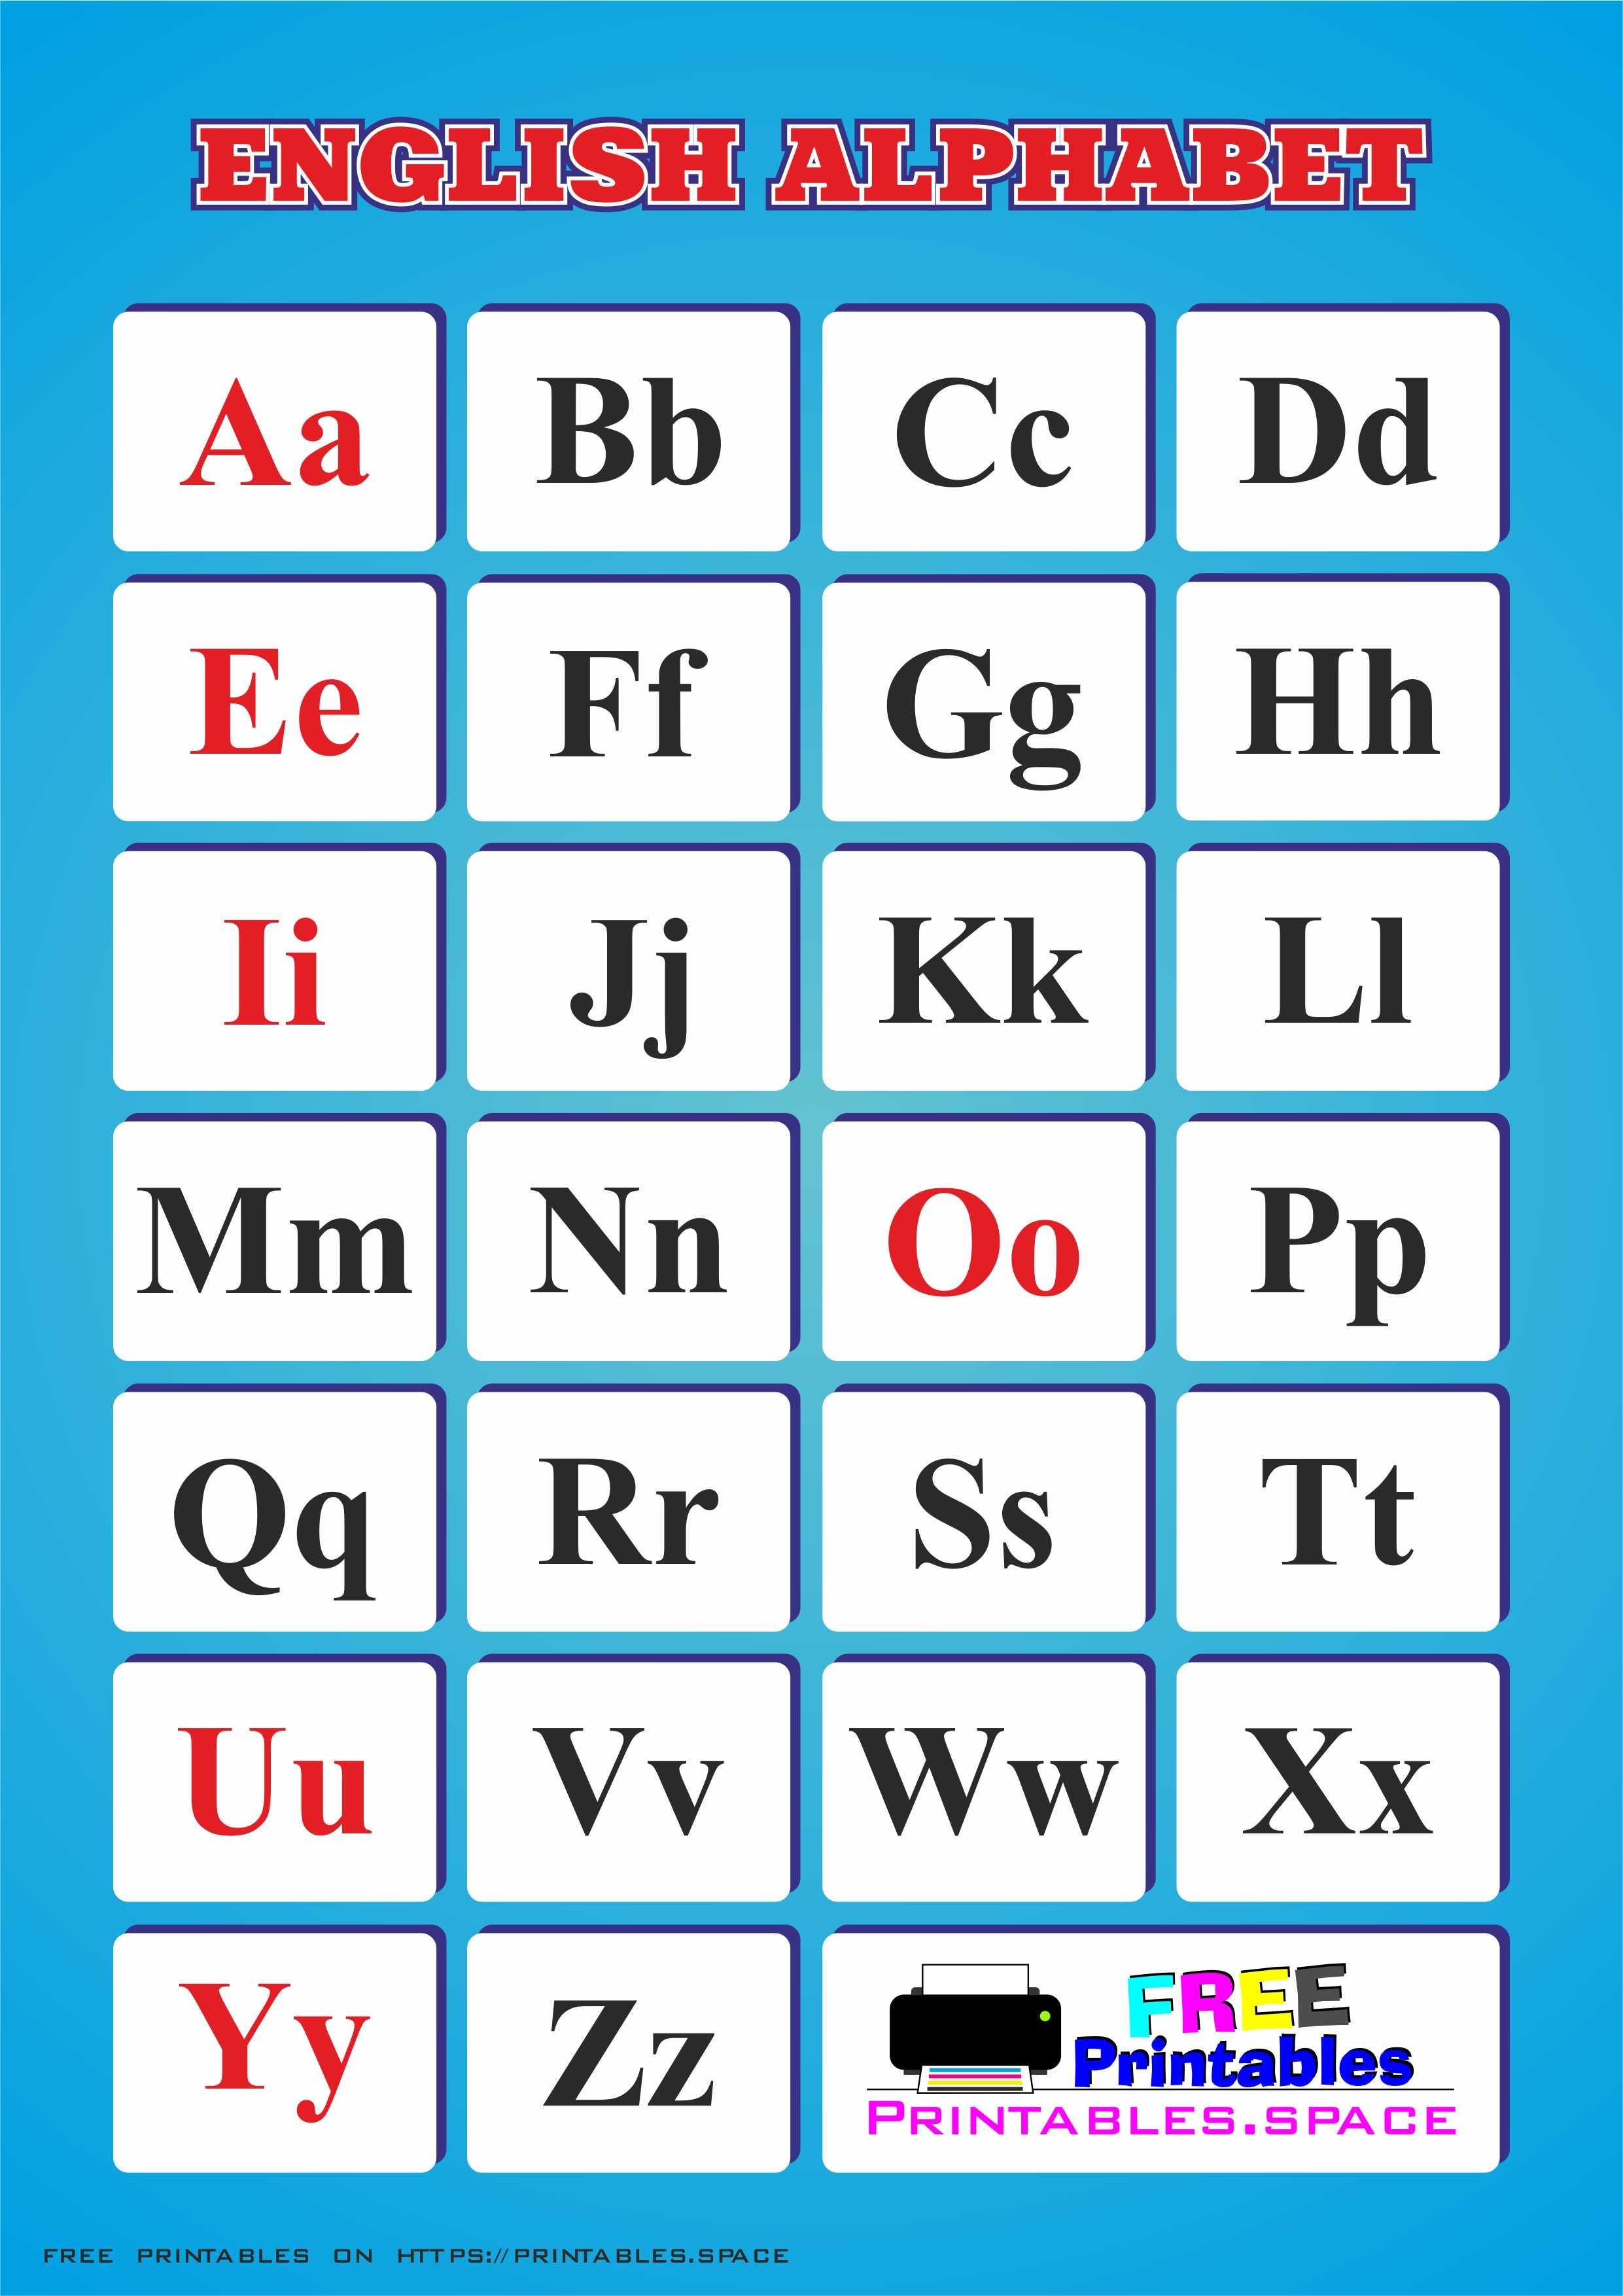 Printable English Alphabet - Free Download - Free Printables - Printable Alphabet Letters Free Download